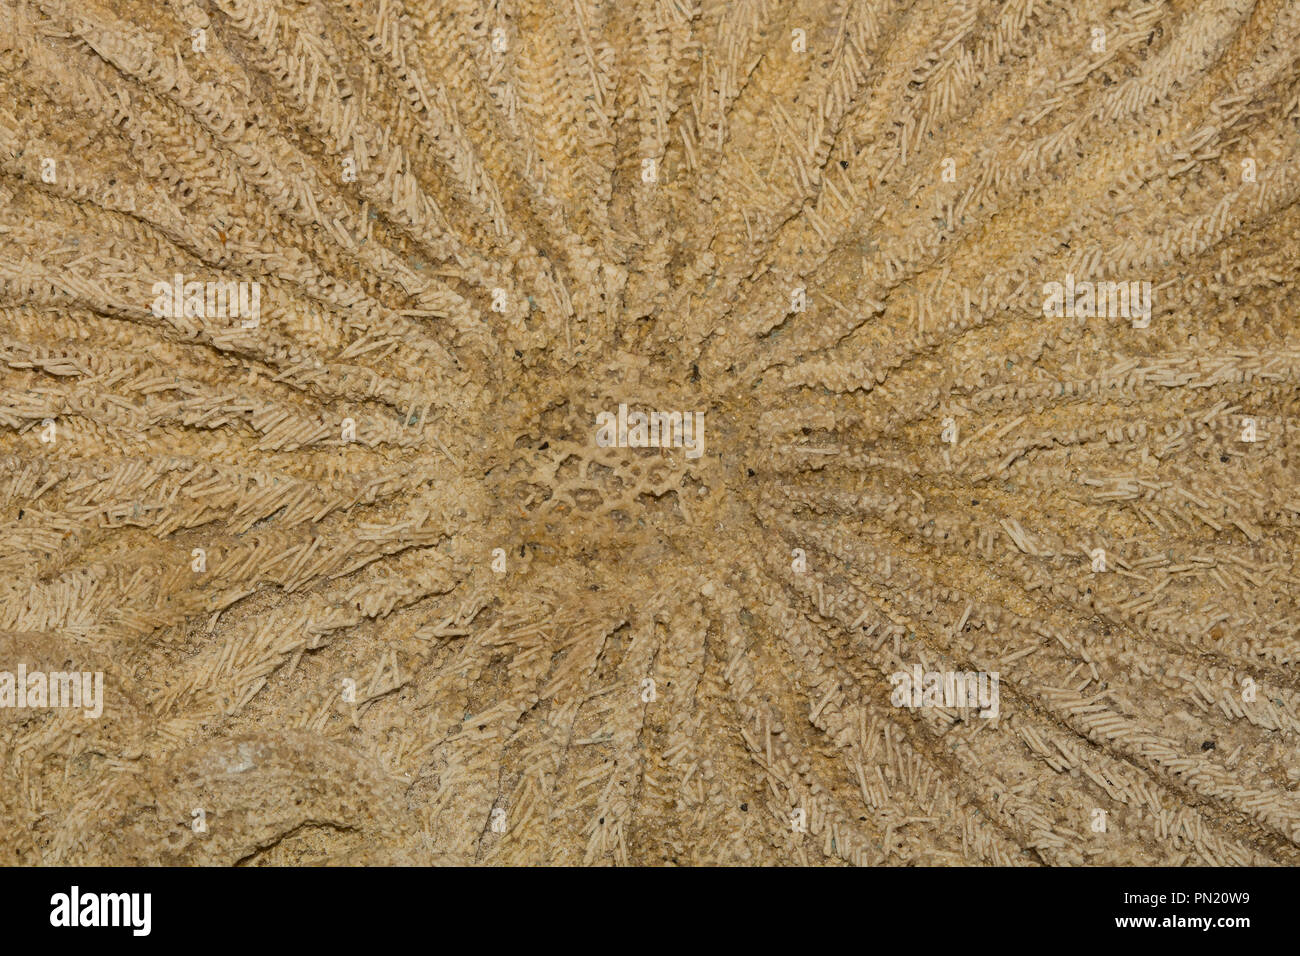 Fossil starfish, a small armed sunstar, Heliaster microbrachius - Stock Image